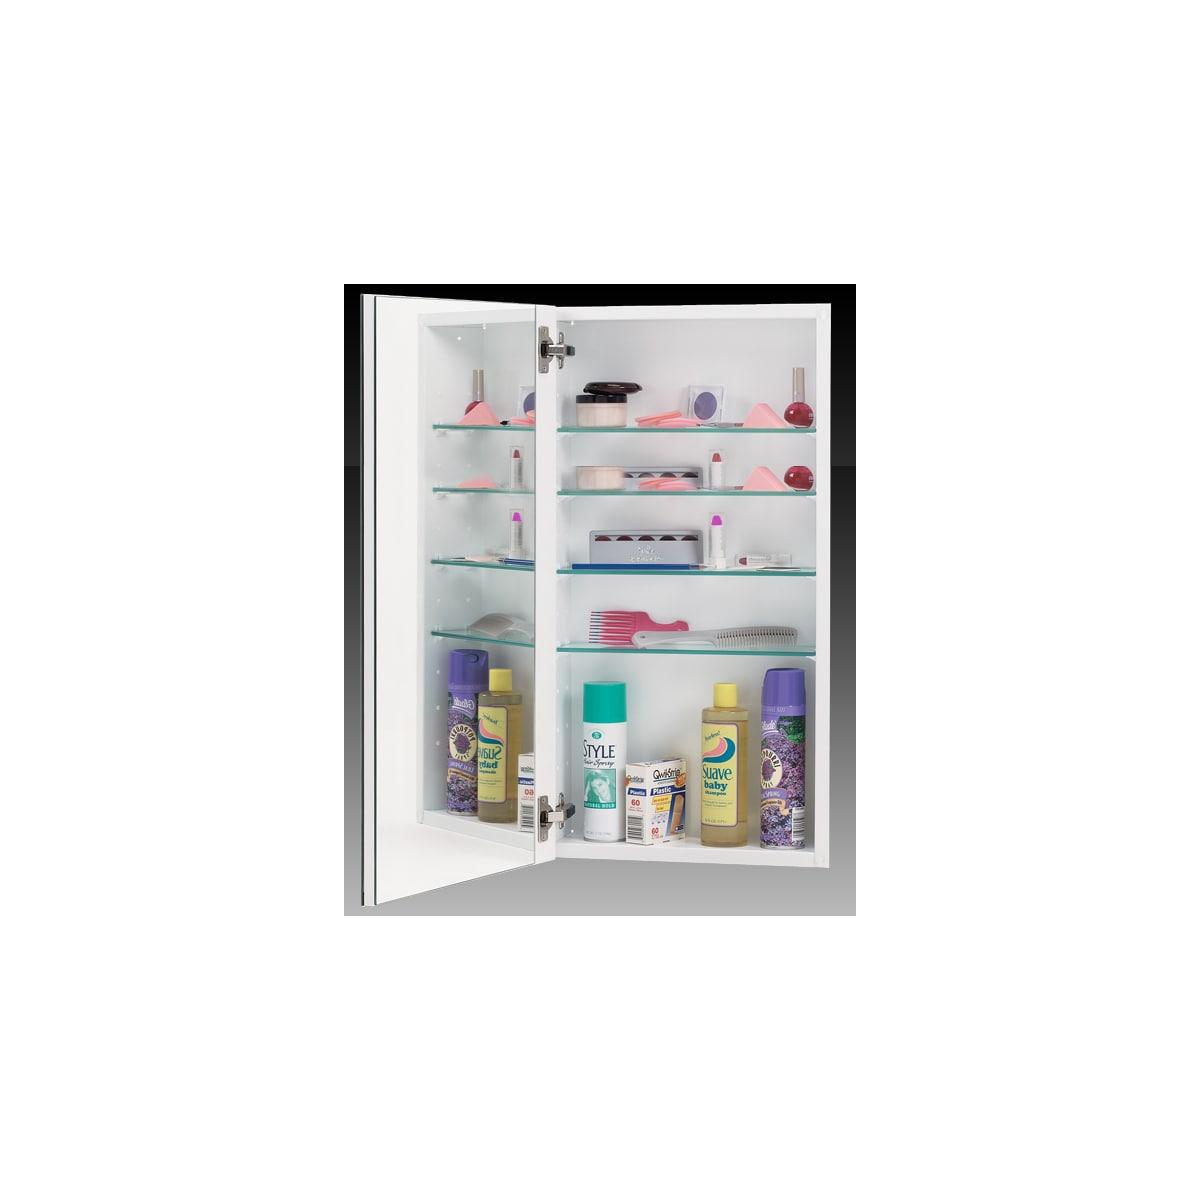 "Alno 1000 Series 15"" x 35"" Single Door Recessed Medicine Cabinet with White Interior with Beveled Mirror"